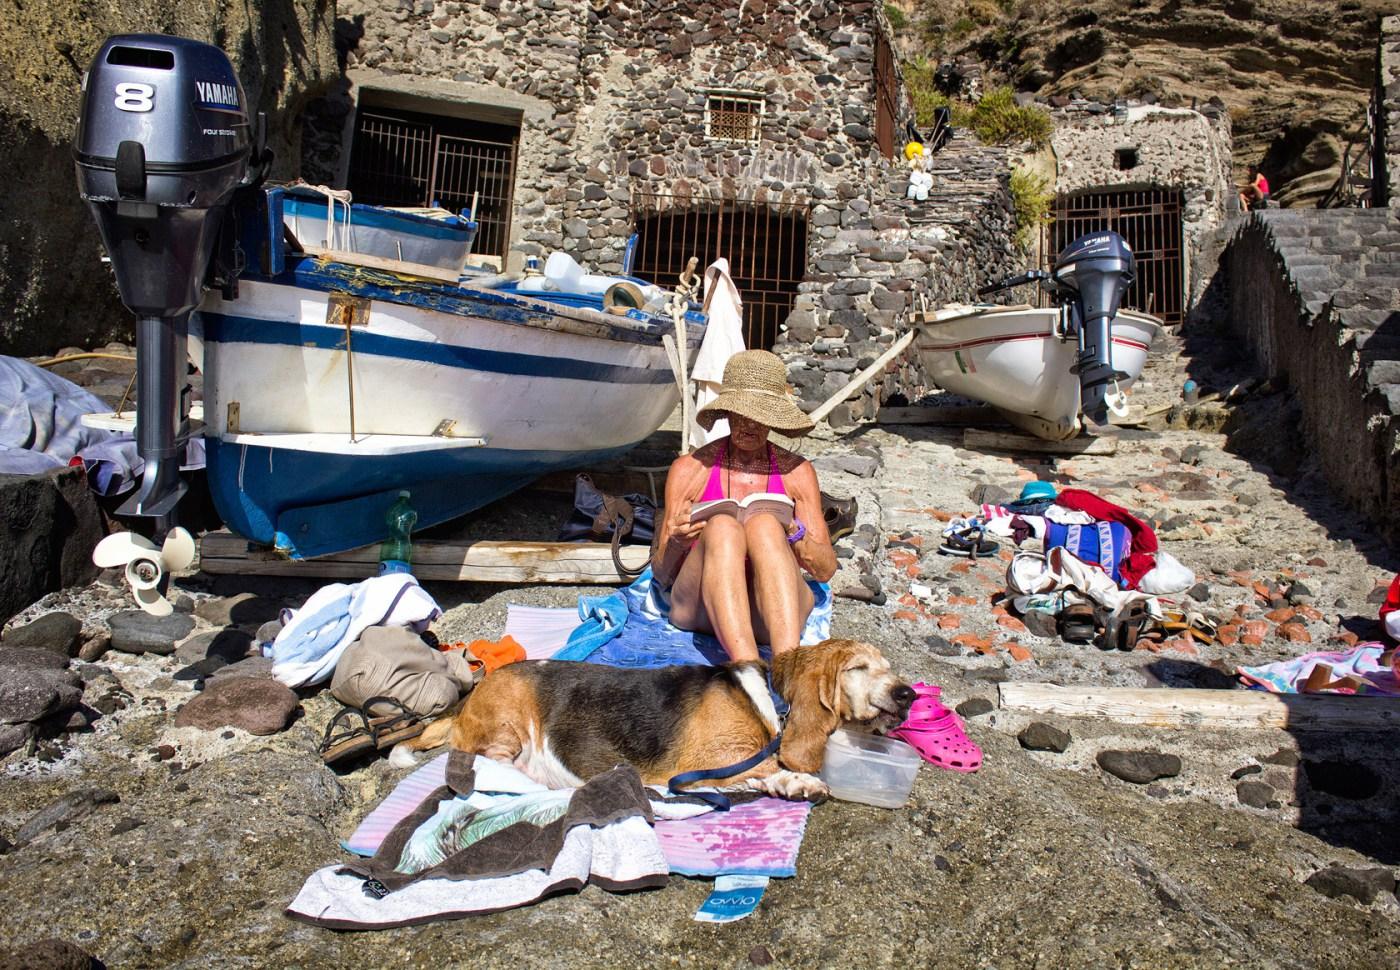 Lorenzo-Grifantini-Beach-Street-Photography-2